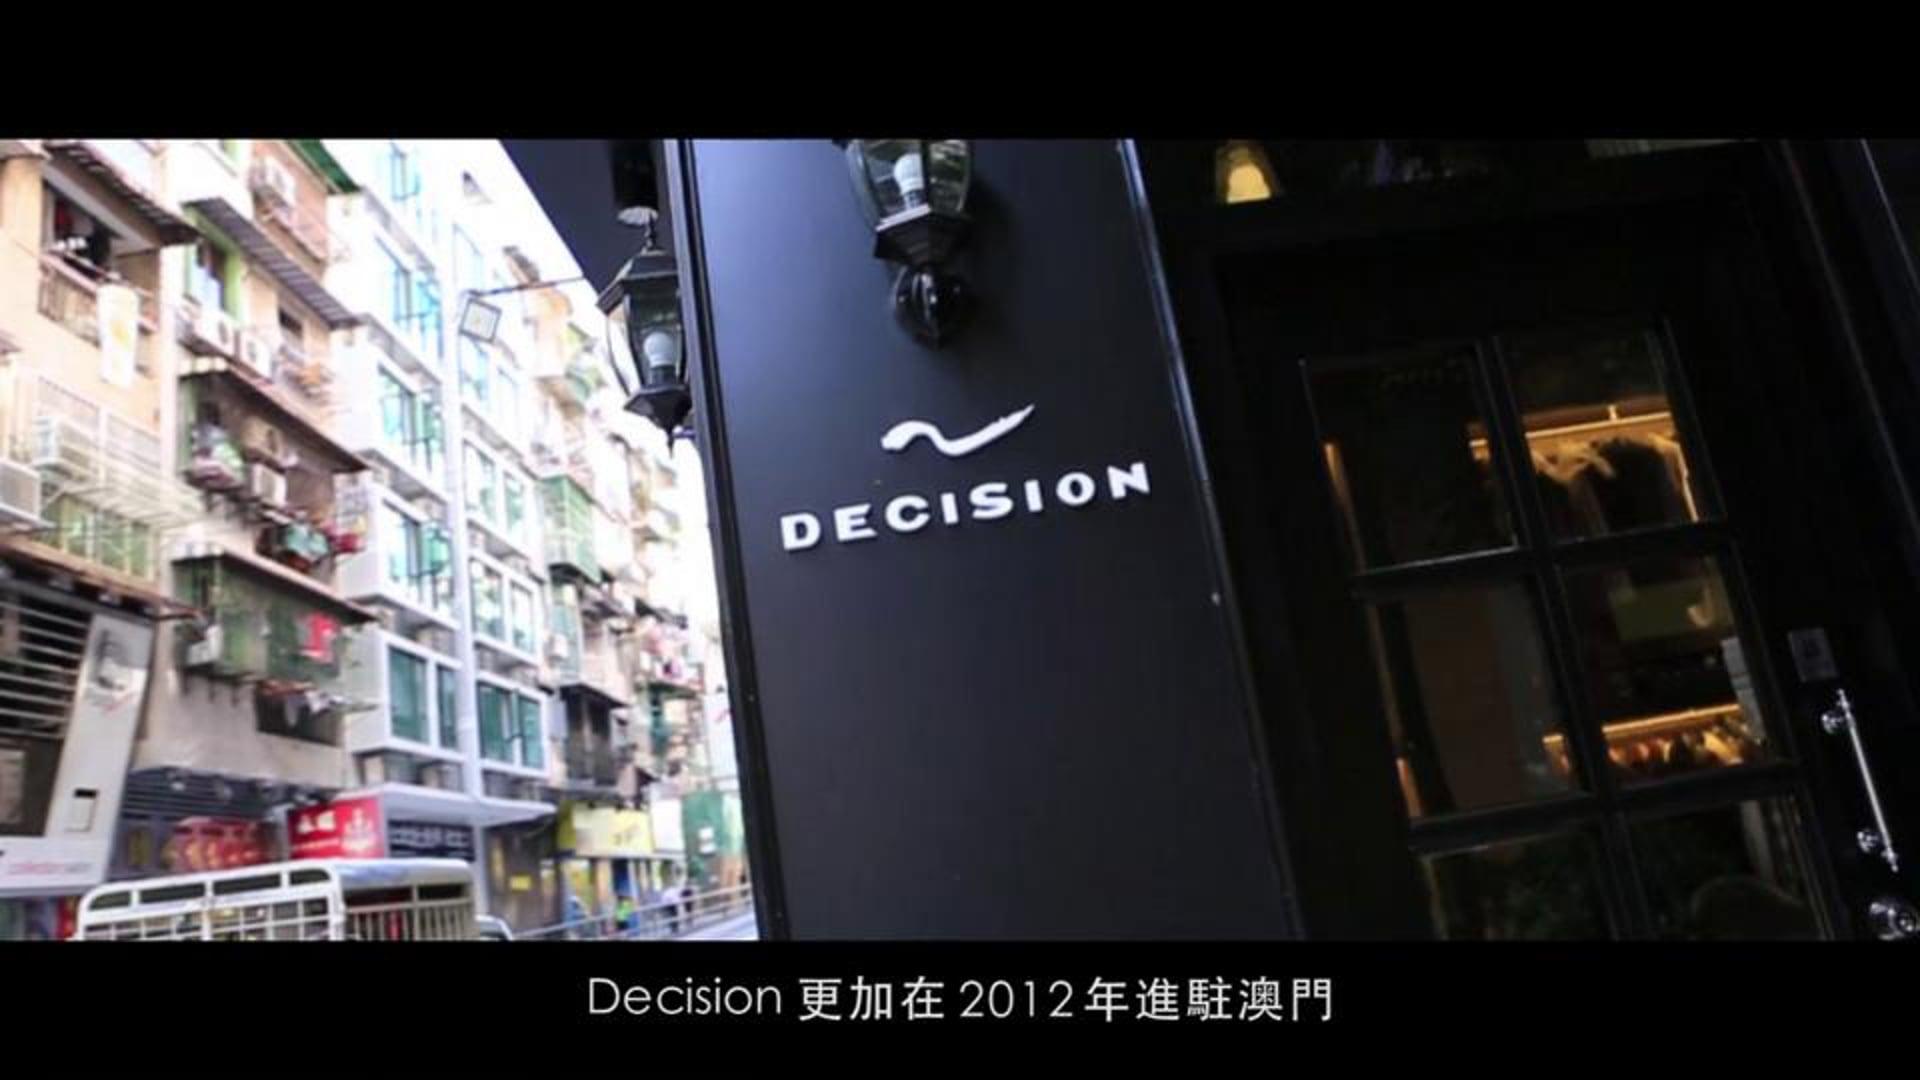 Decision - Tuxedo & Suit